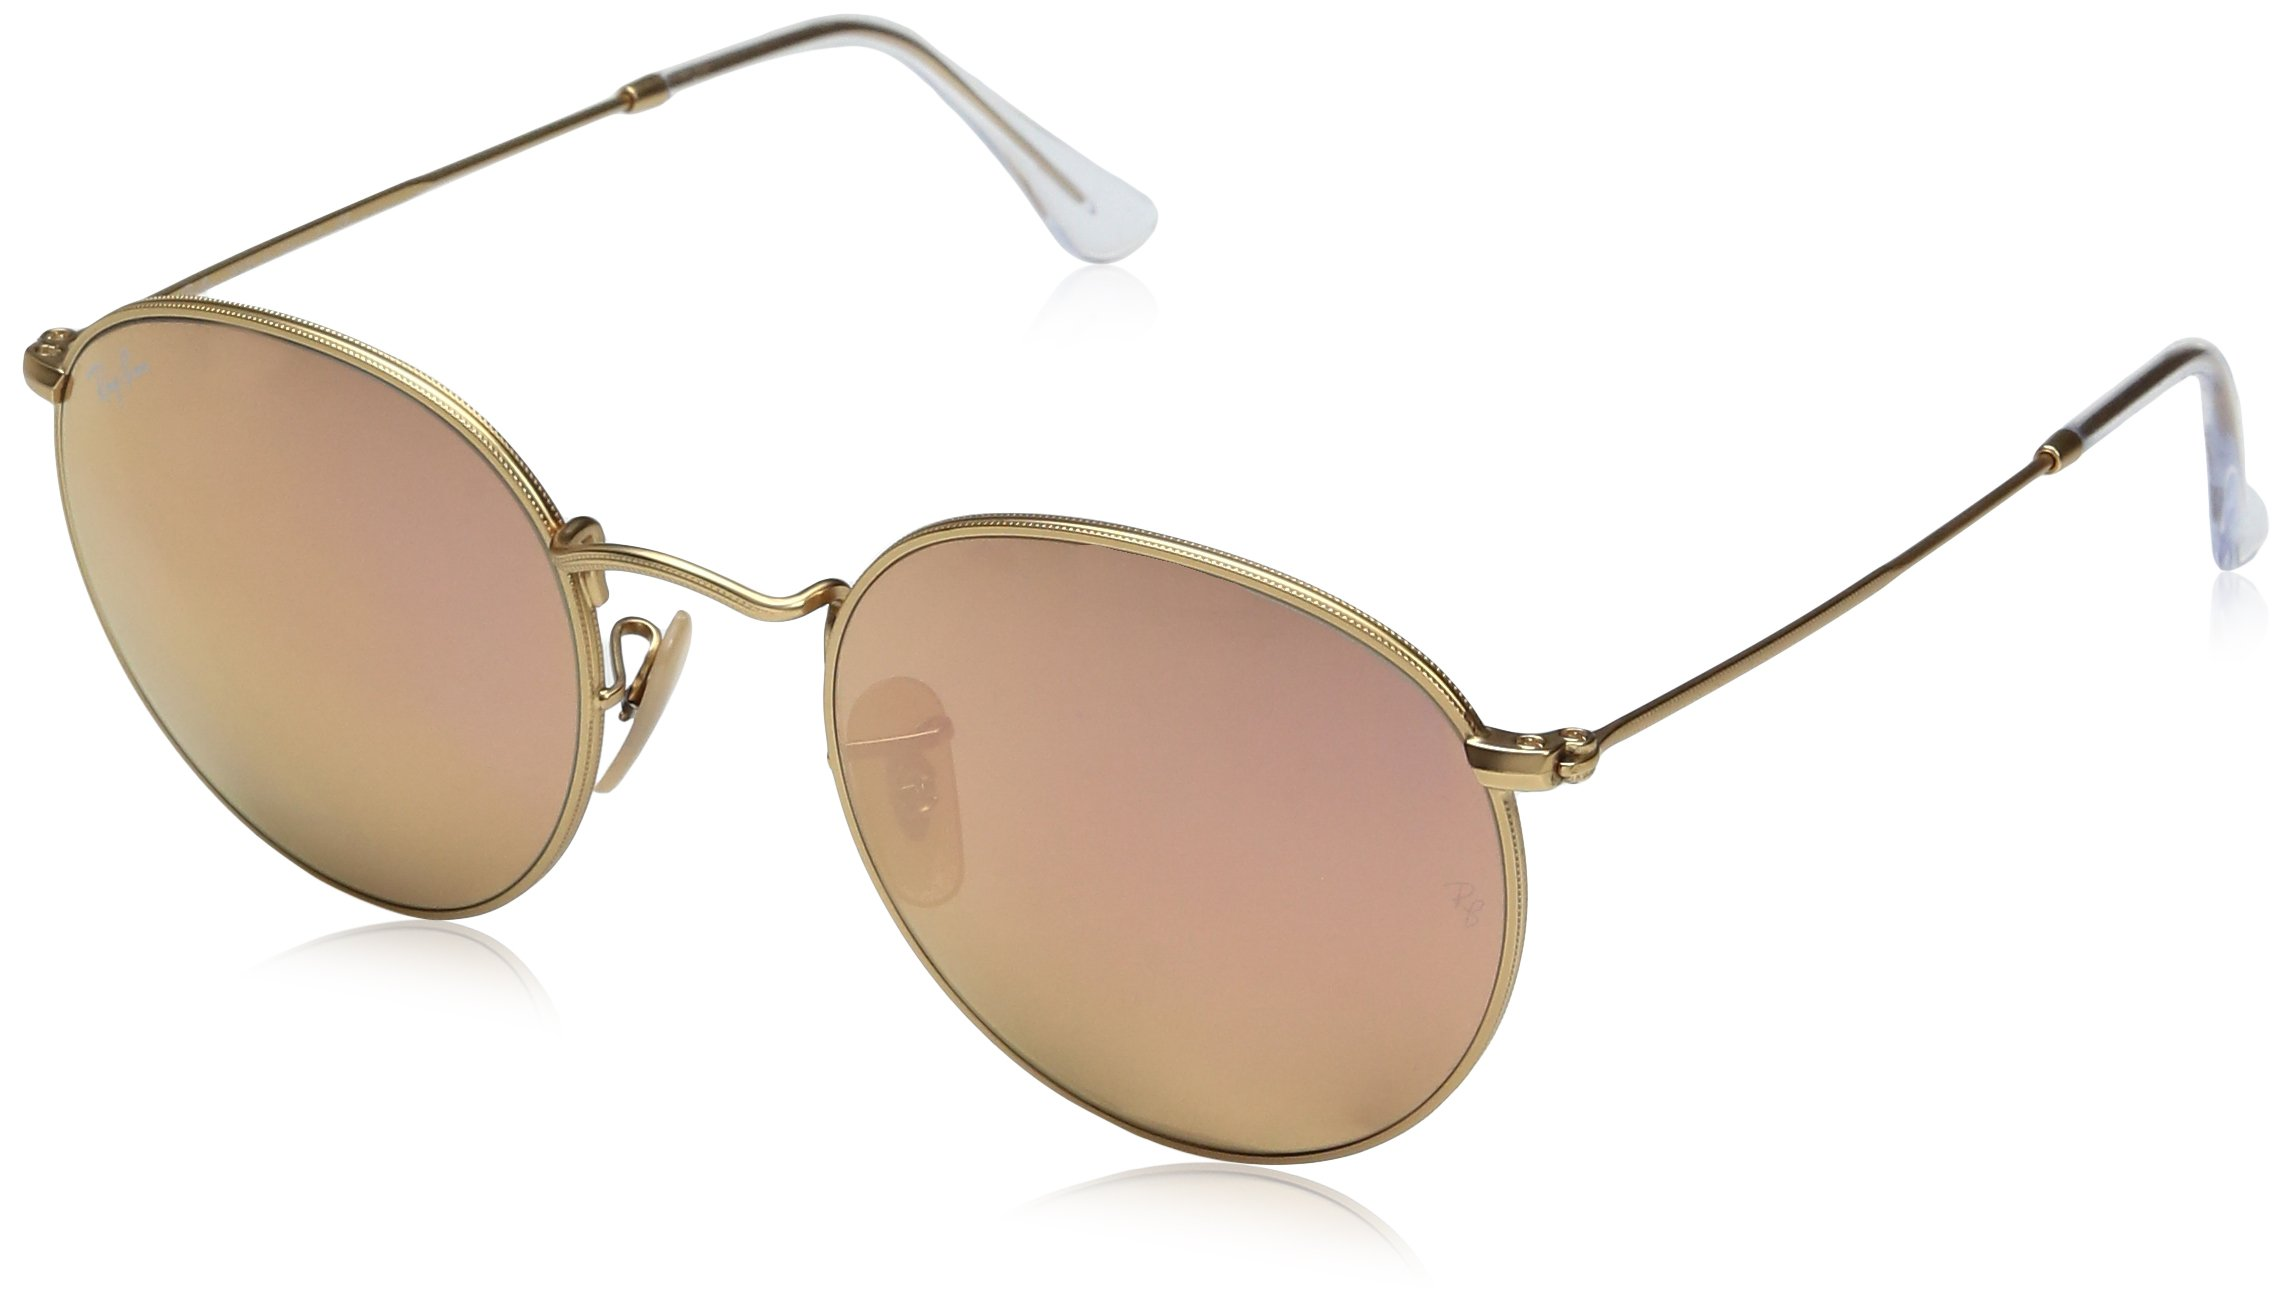 2da0c4daa8b Buy Ray-Ban Round Metal Unisex Sunglasses RB3447-029 in Cheap Price ...